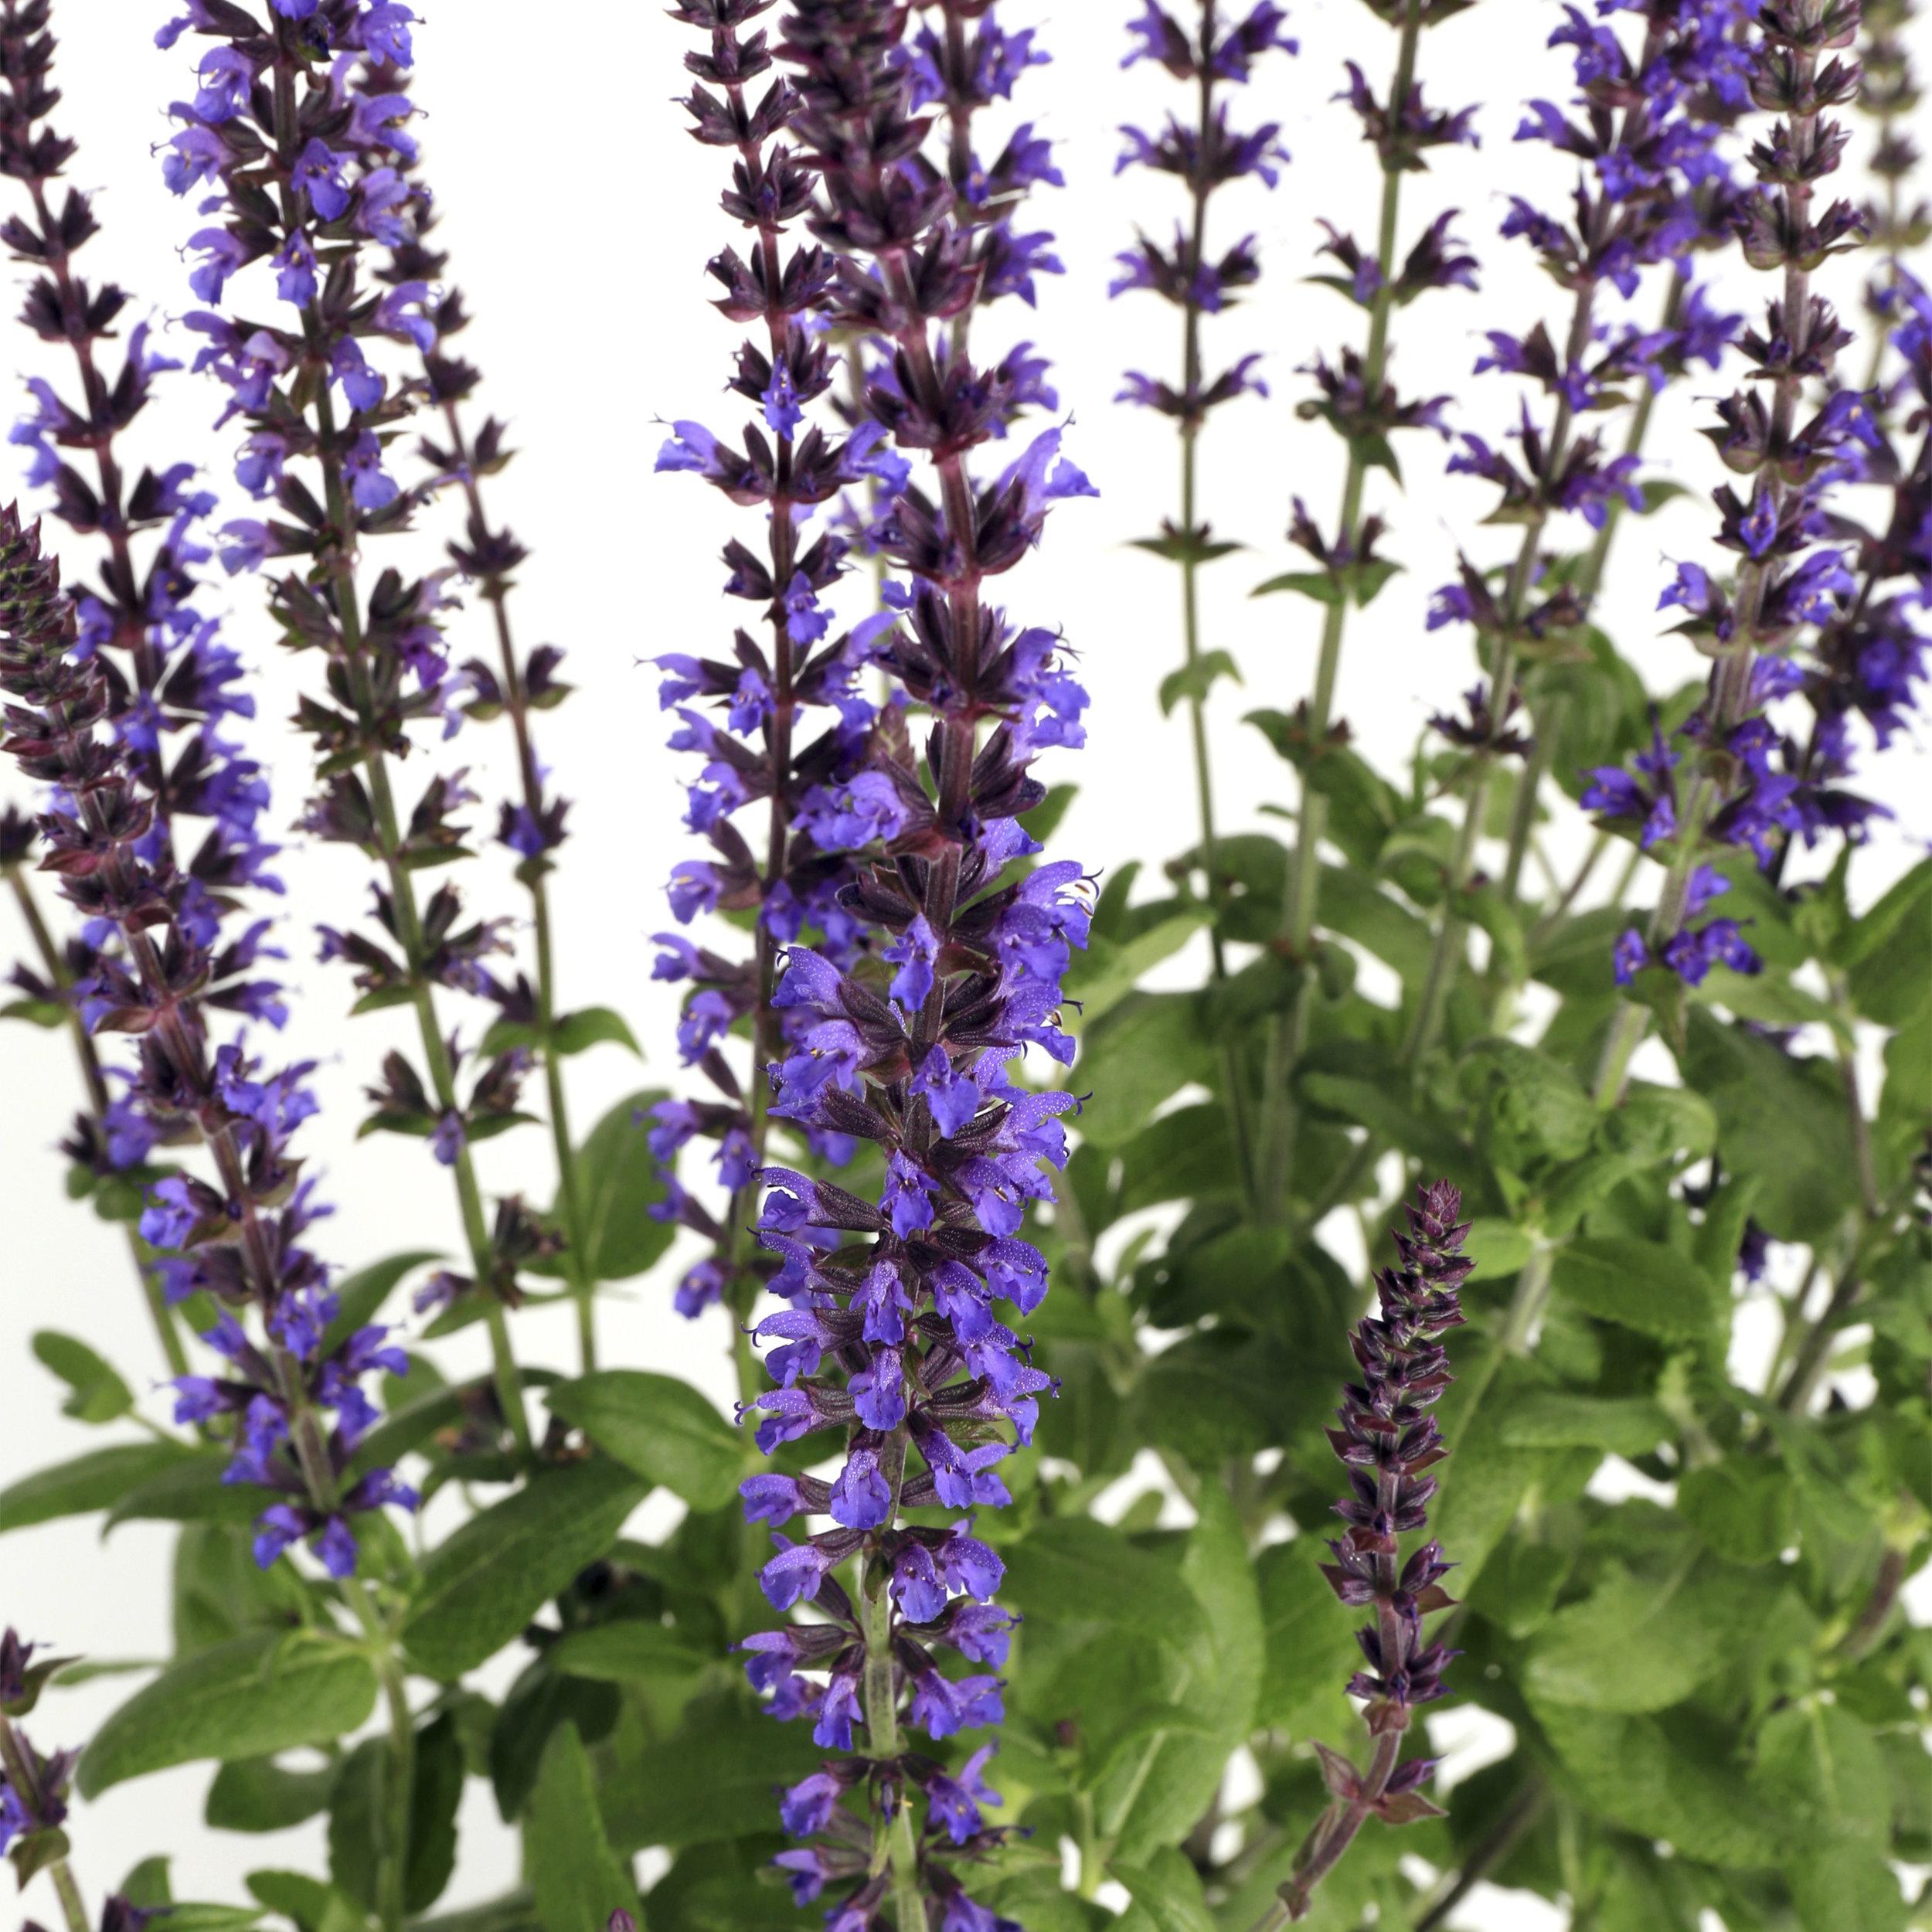 HR_Seed_Salvia_Merleau®_Merleau®_Blue_Compact_70007976_1.jpg